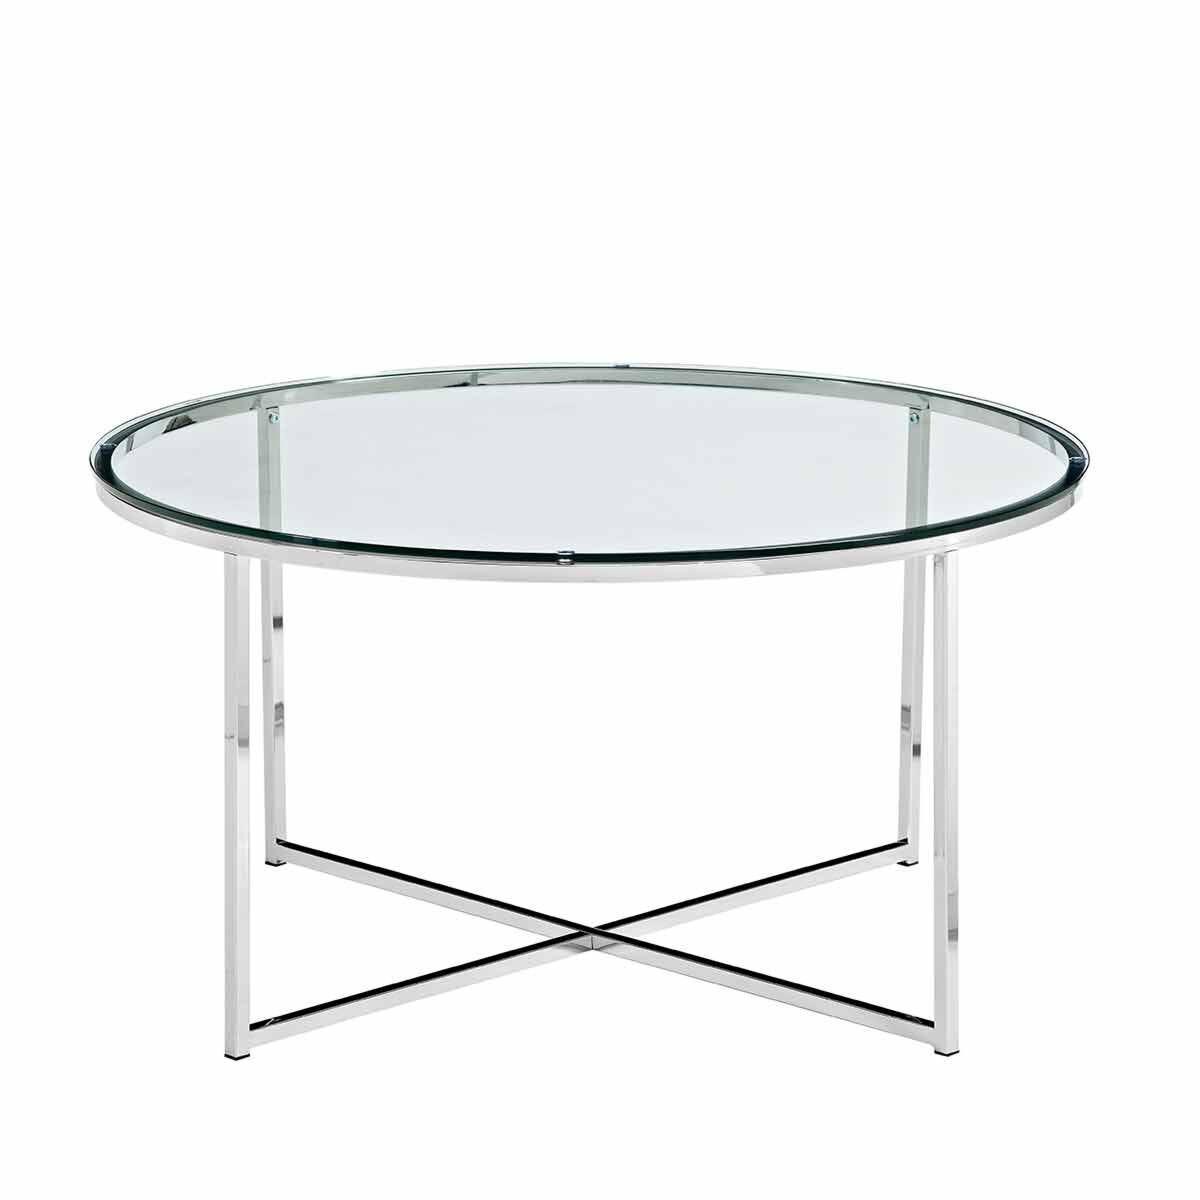 Zaragoza Mid Century Modern Round Coffee Table